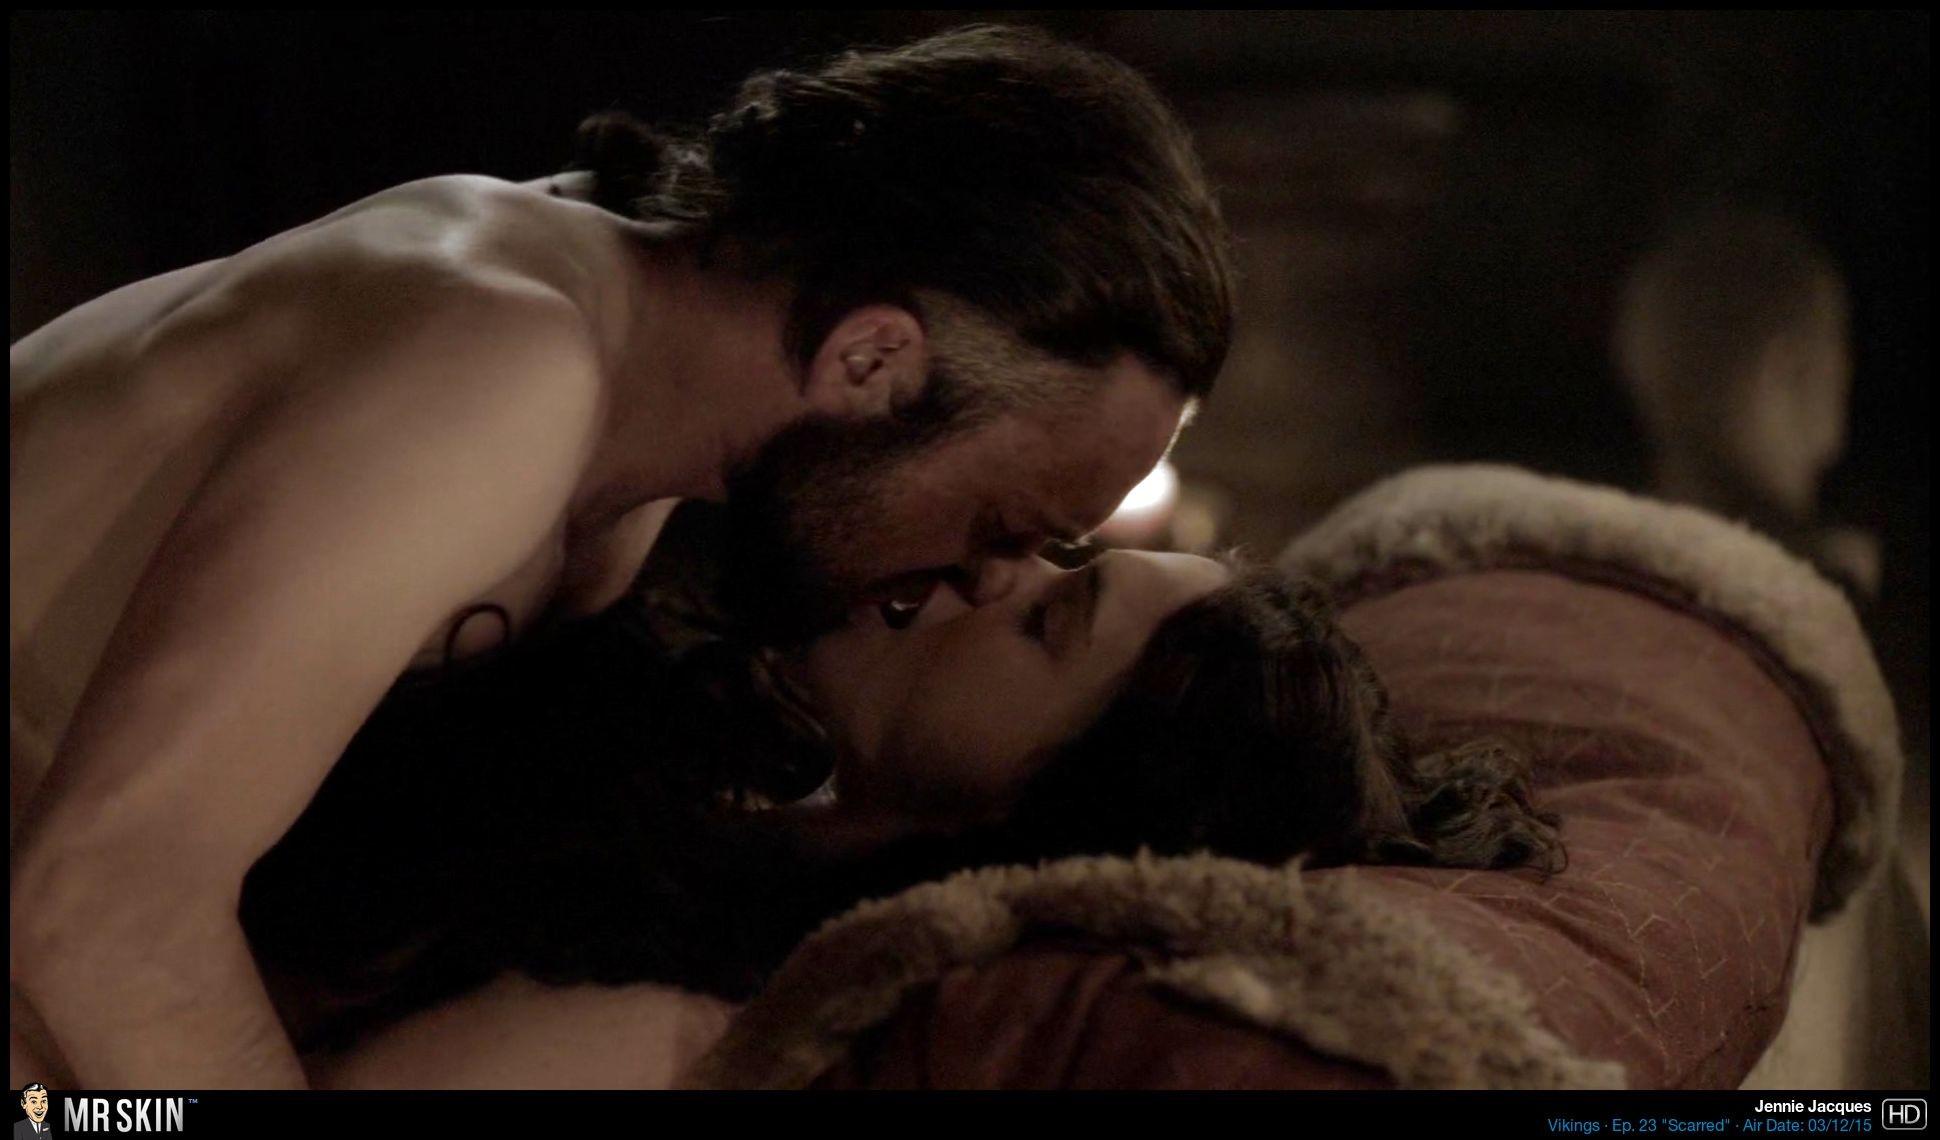 Jennie jacques naked scene from vikings on scandalplanetcom - 3 2